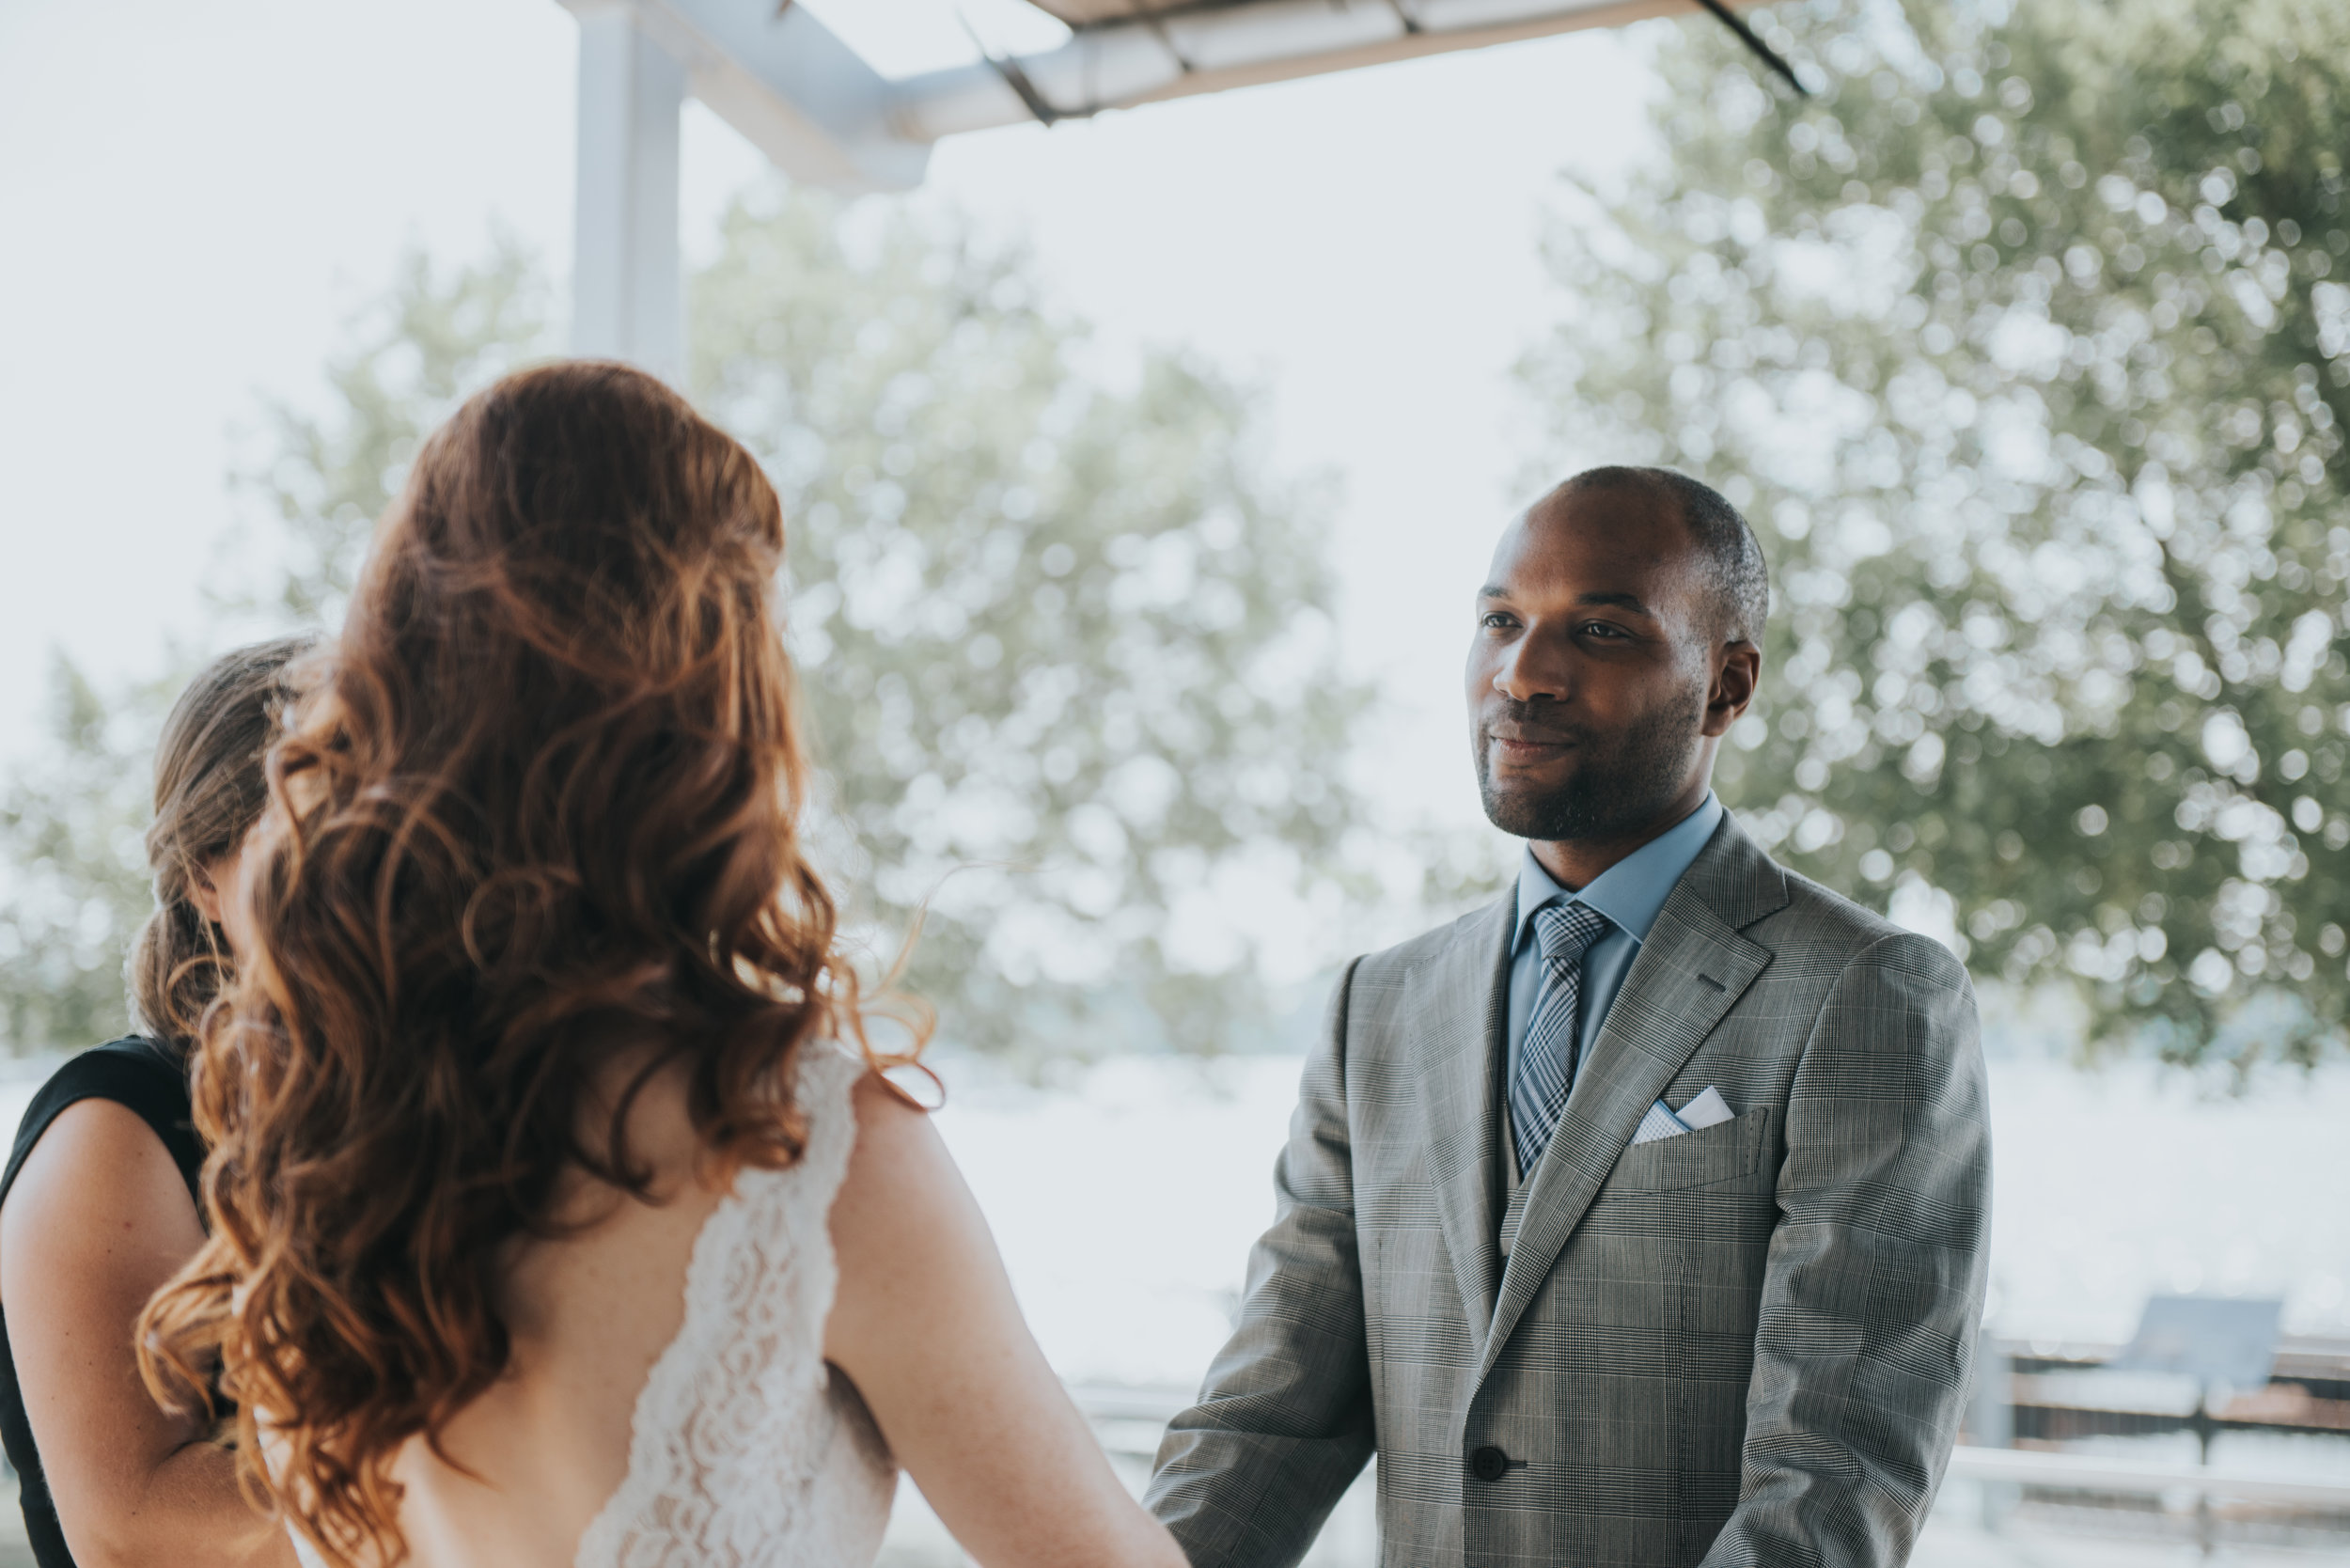 bride-groom-ceremony-toronto-outdoor-summer-wedding-documentary-wedding-photography-by-willow-birch-photo.jpg